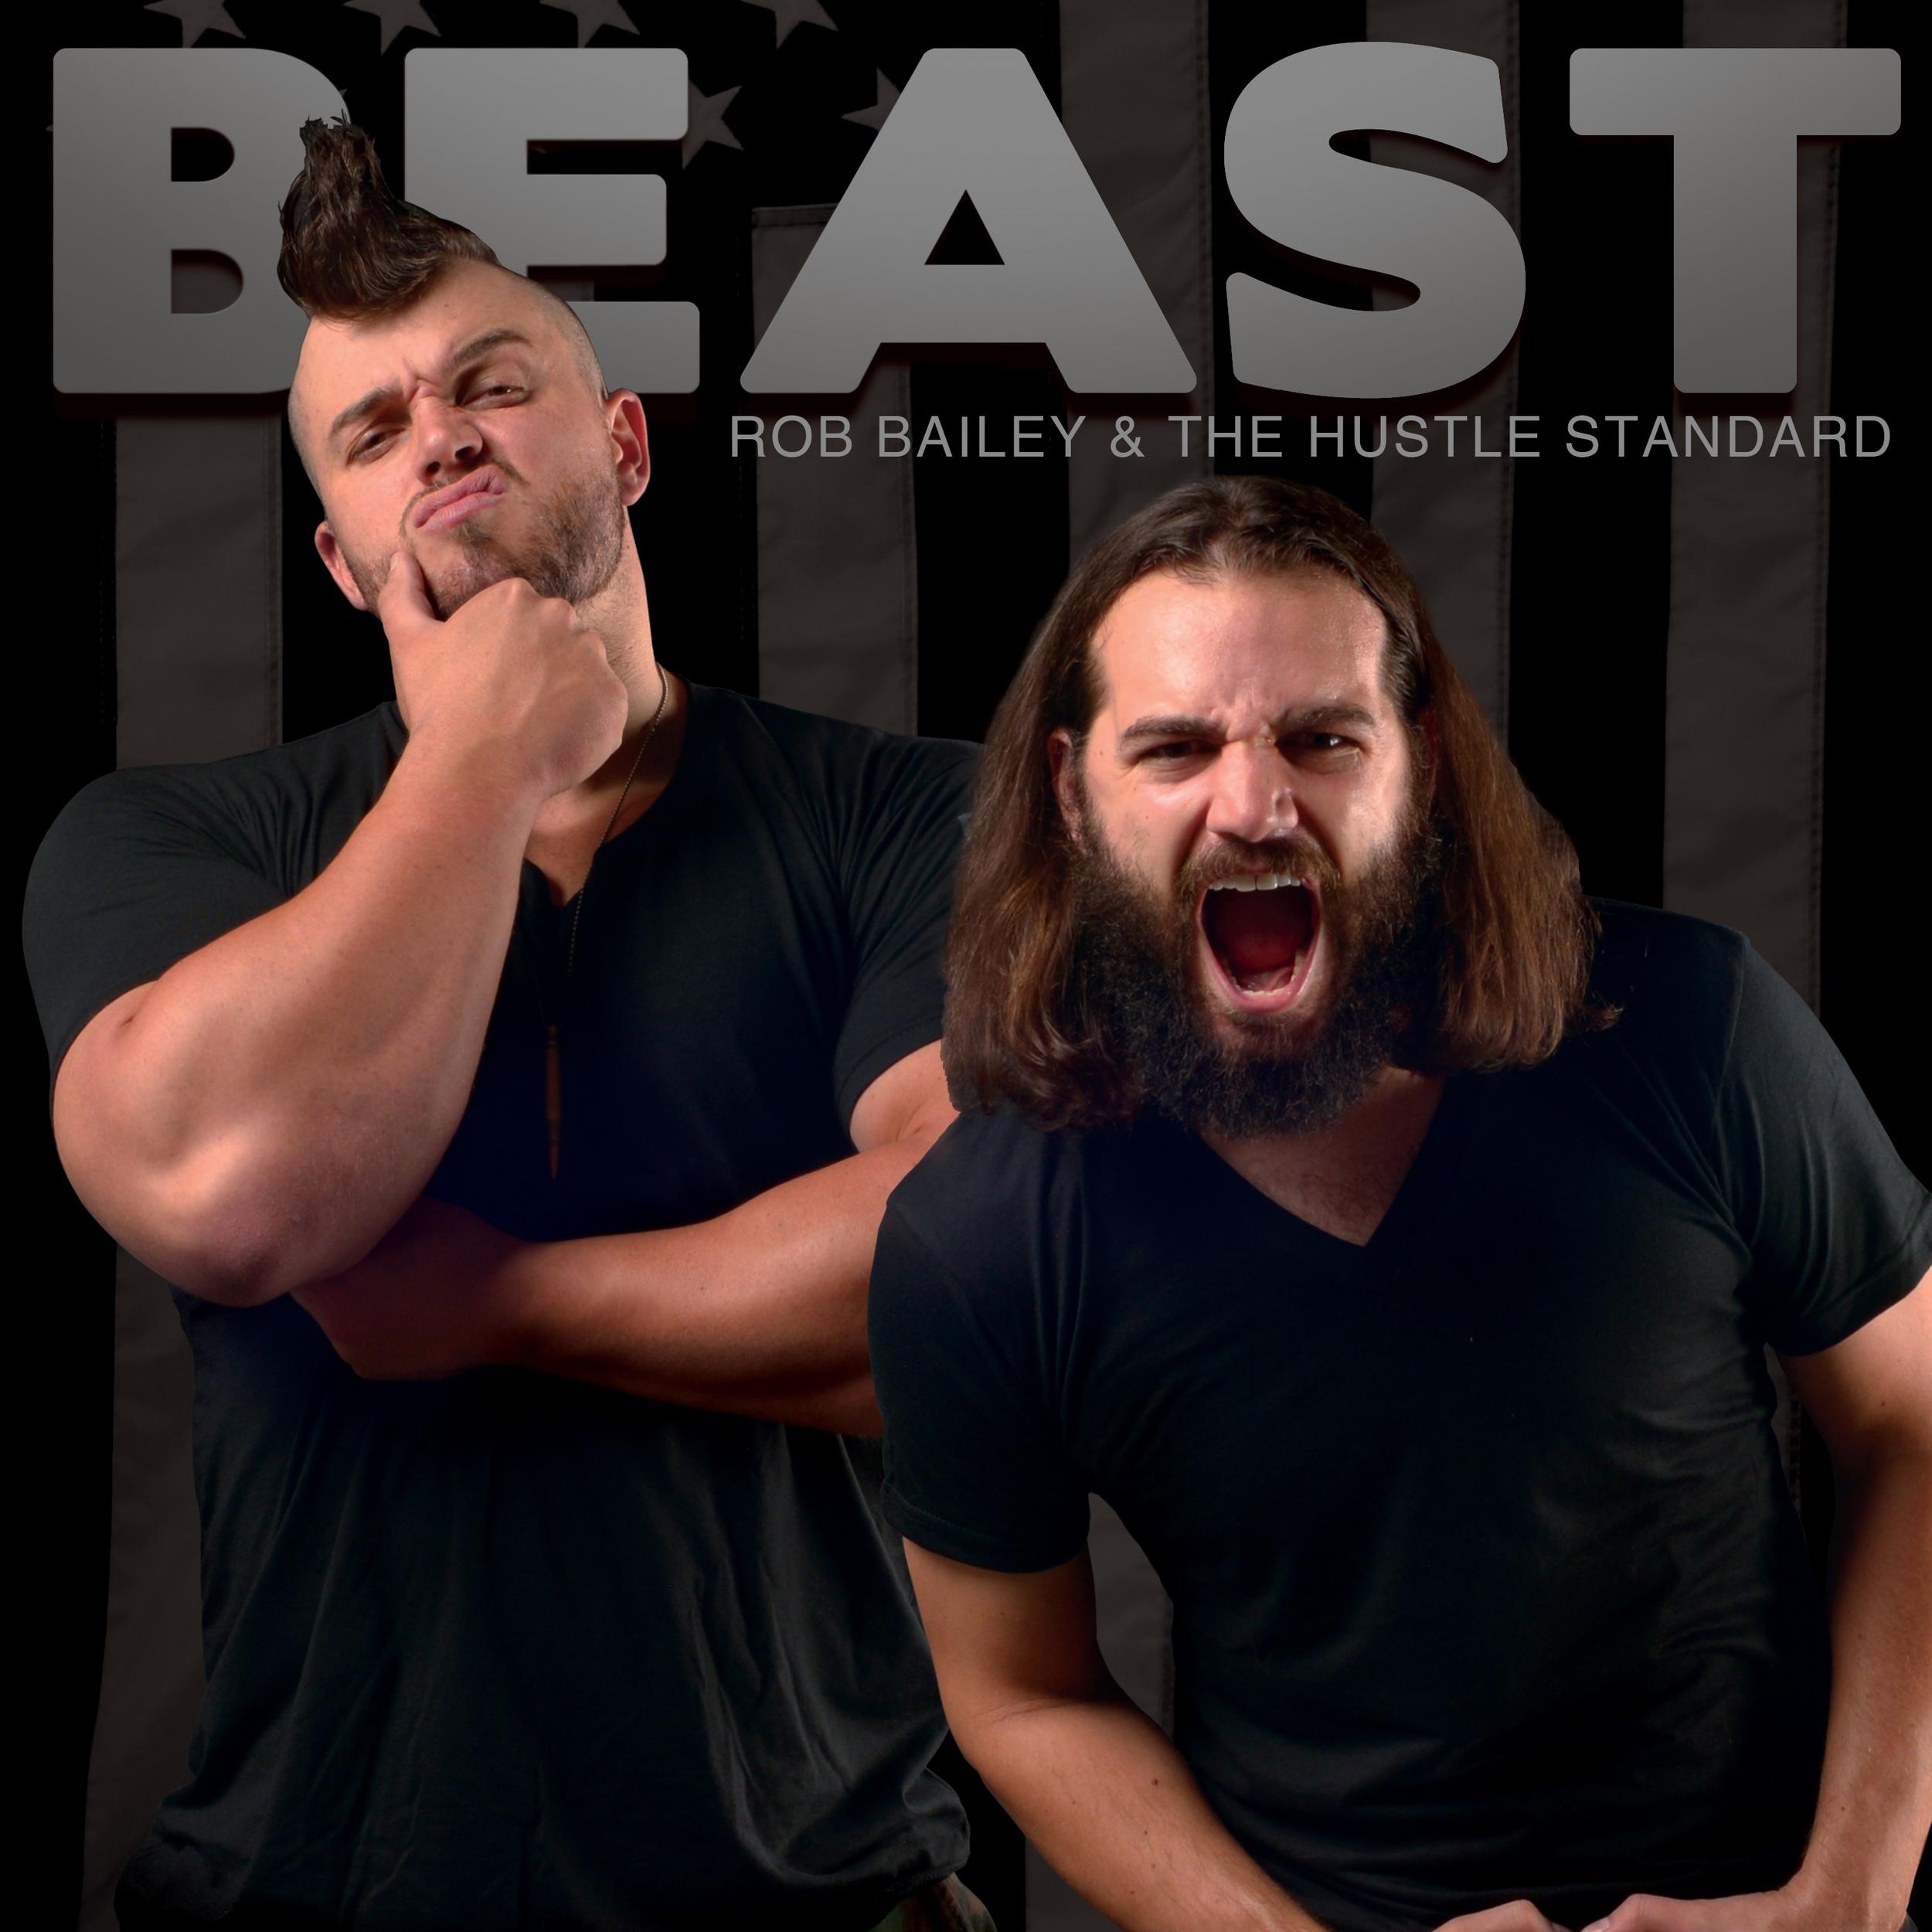 beast cover.jpg